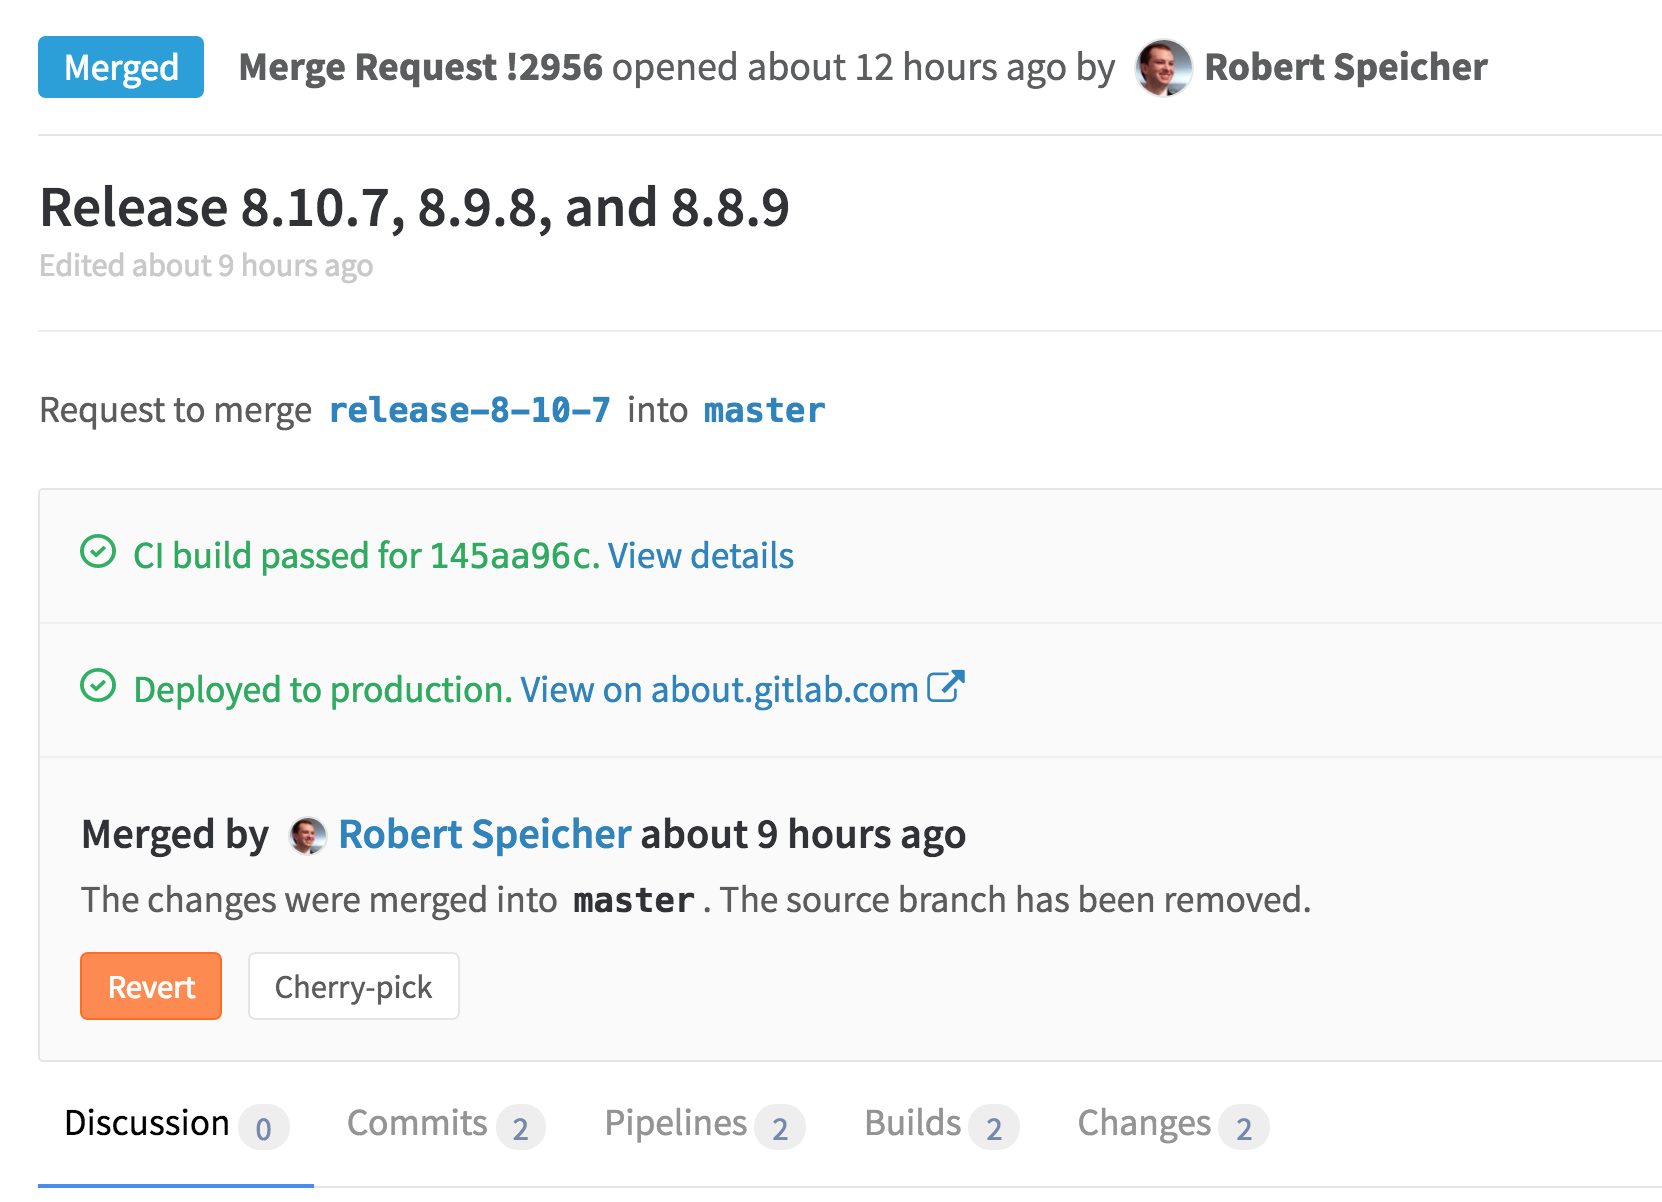 See deploy status in merge request in GitLab 8.11